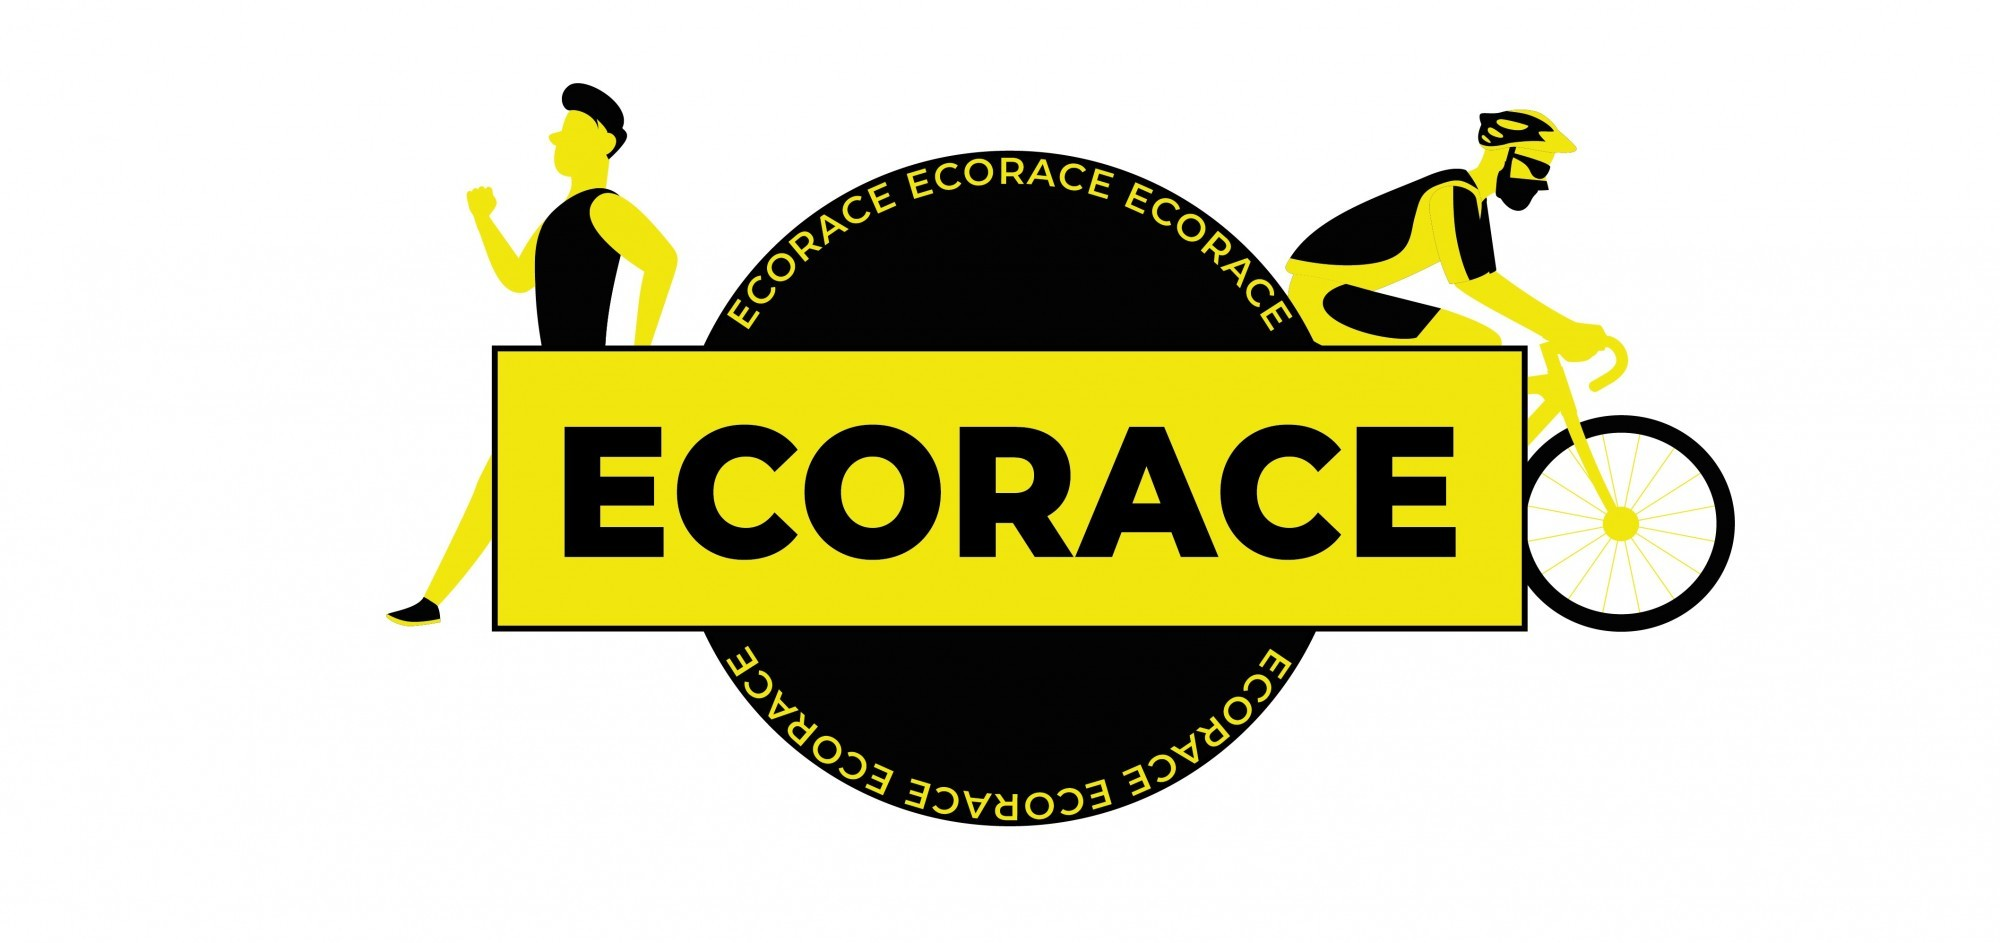 ECORACE Virtual Run and Ride 2021